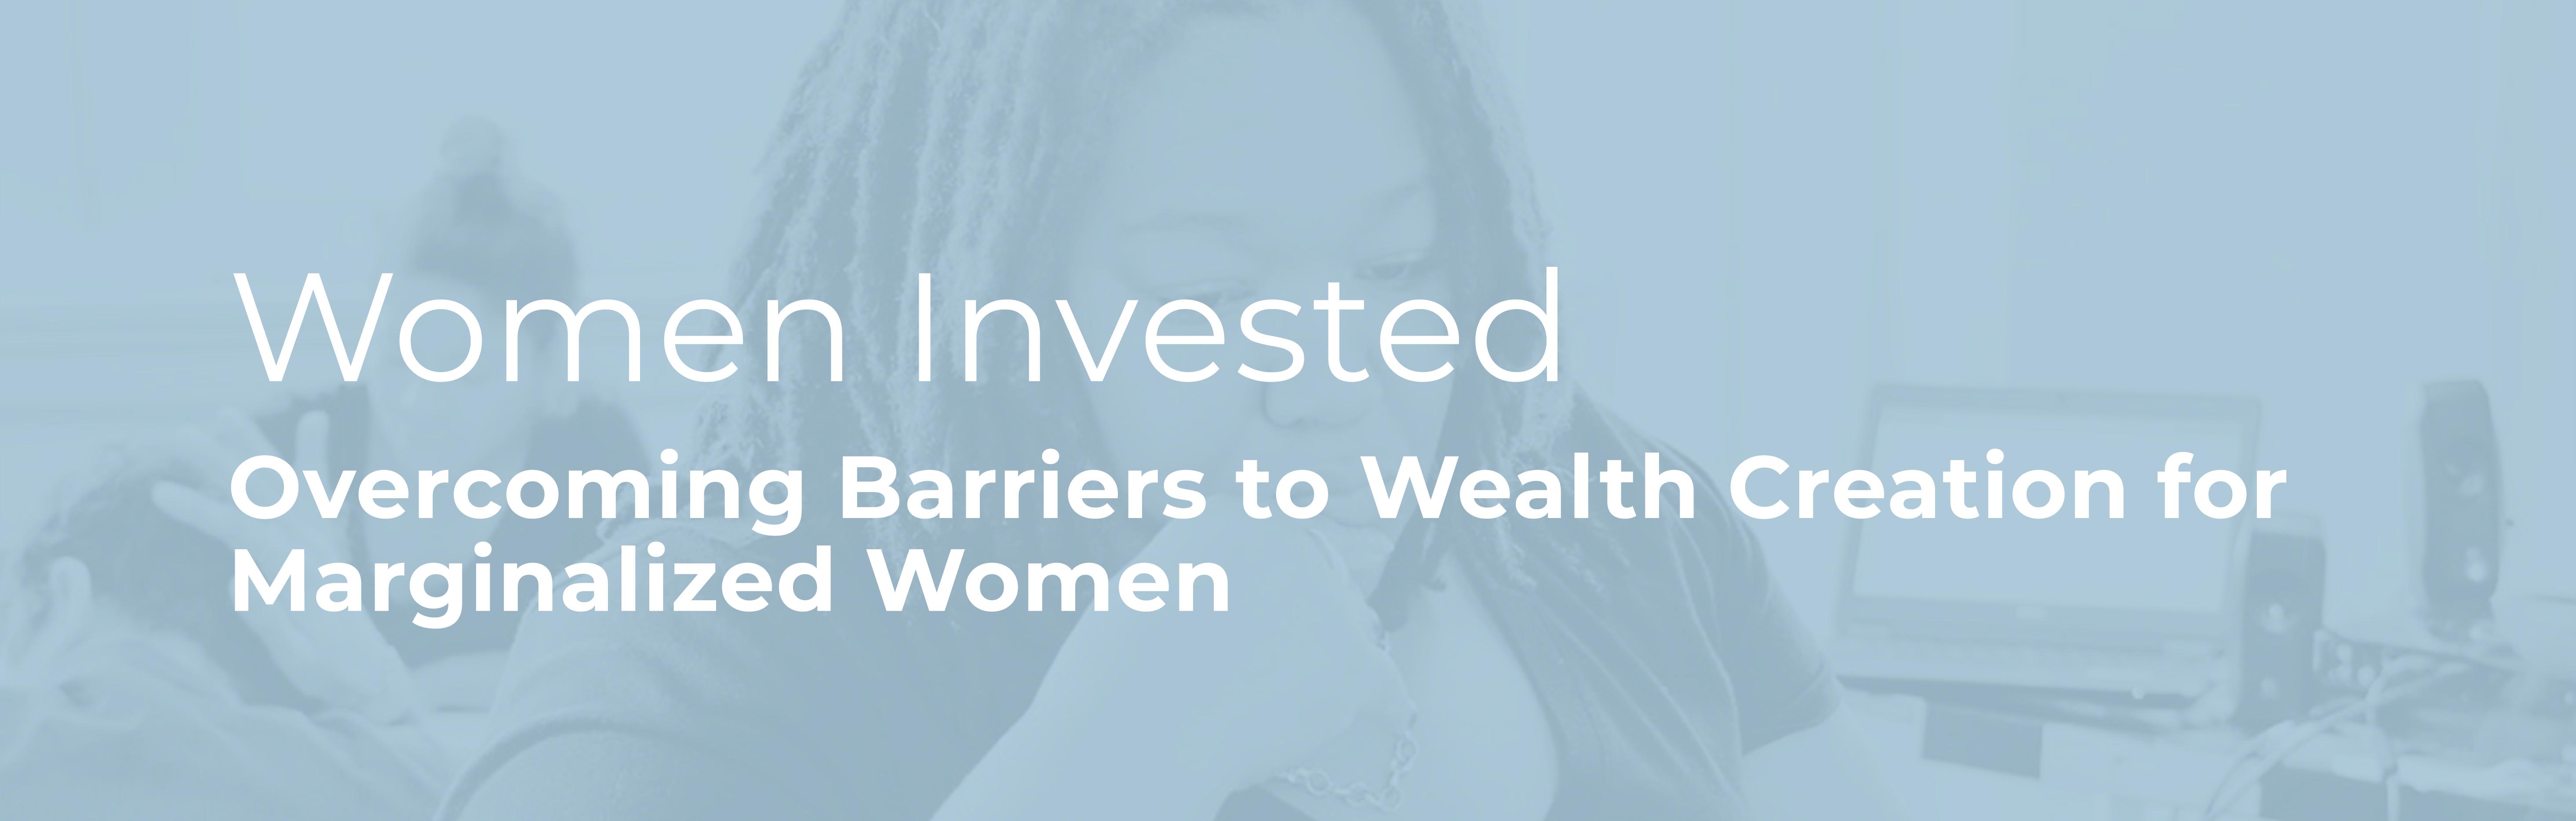 women invested header